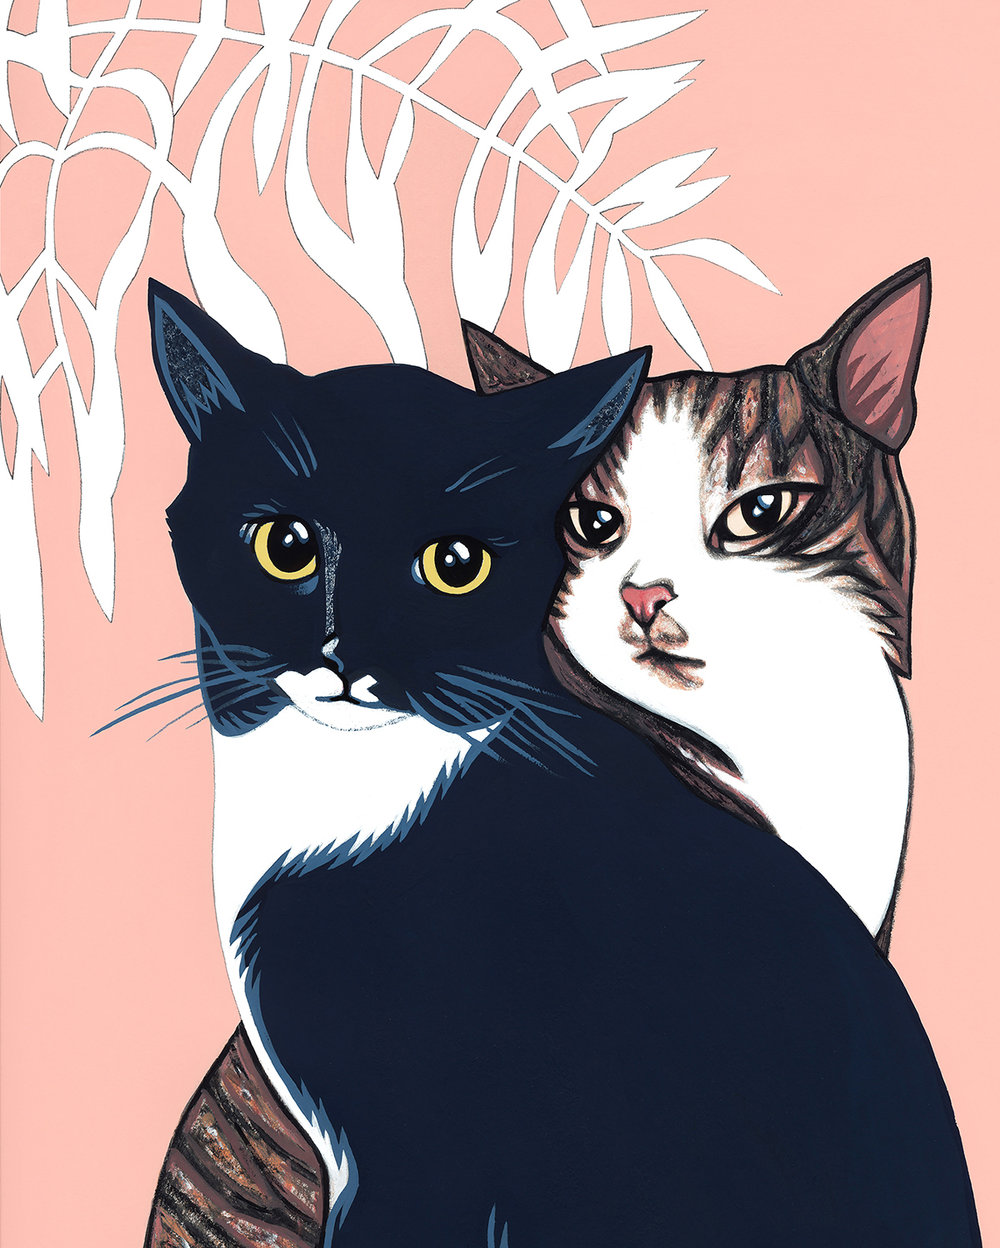 CAT LOVECATS 8x10 WEBSITE.jpg